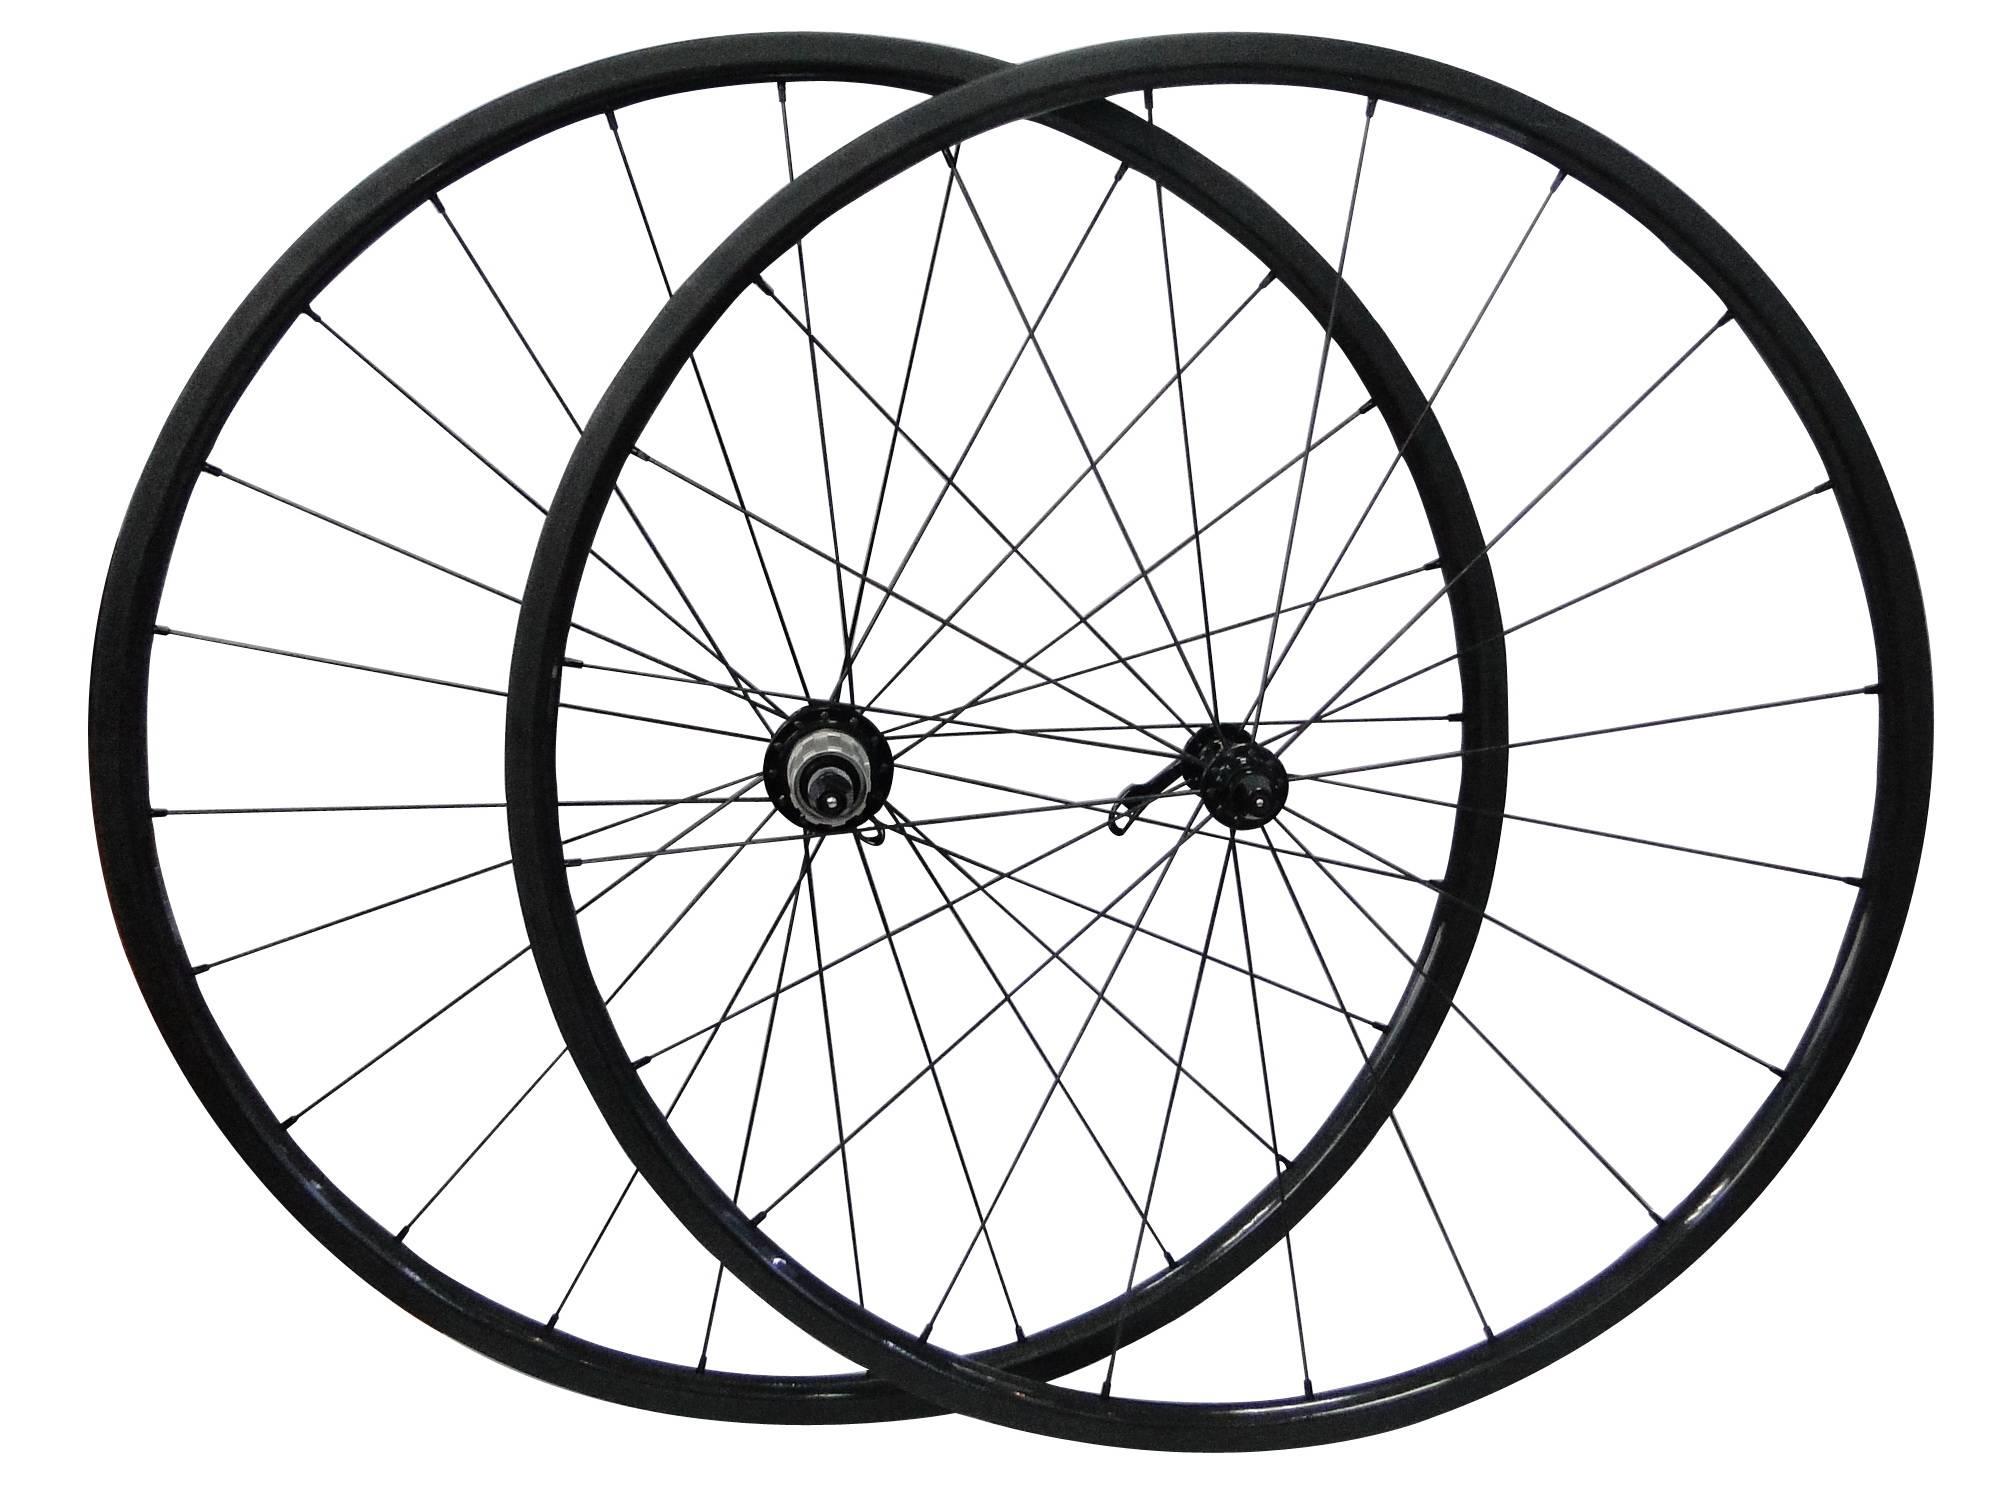 super light carbon wheel 20mm tubular